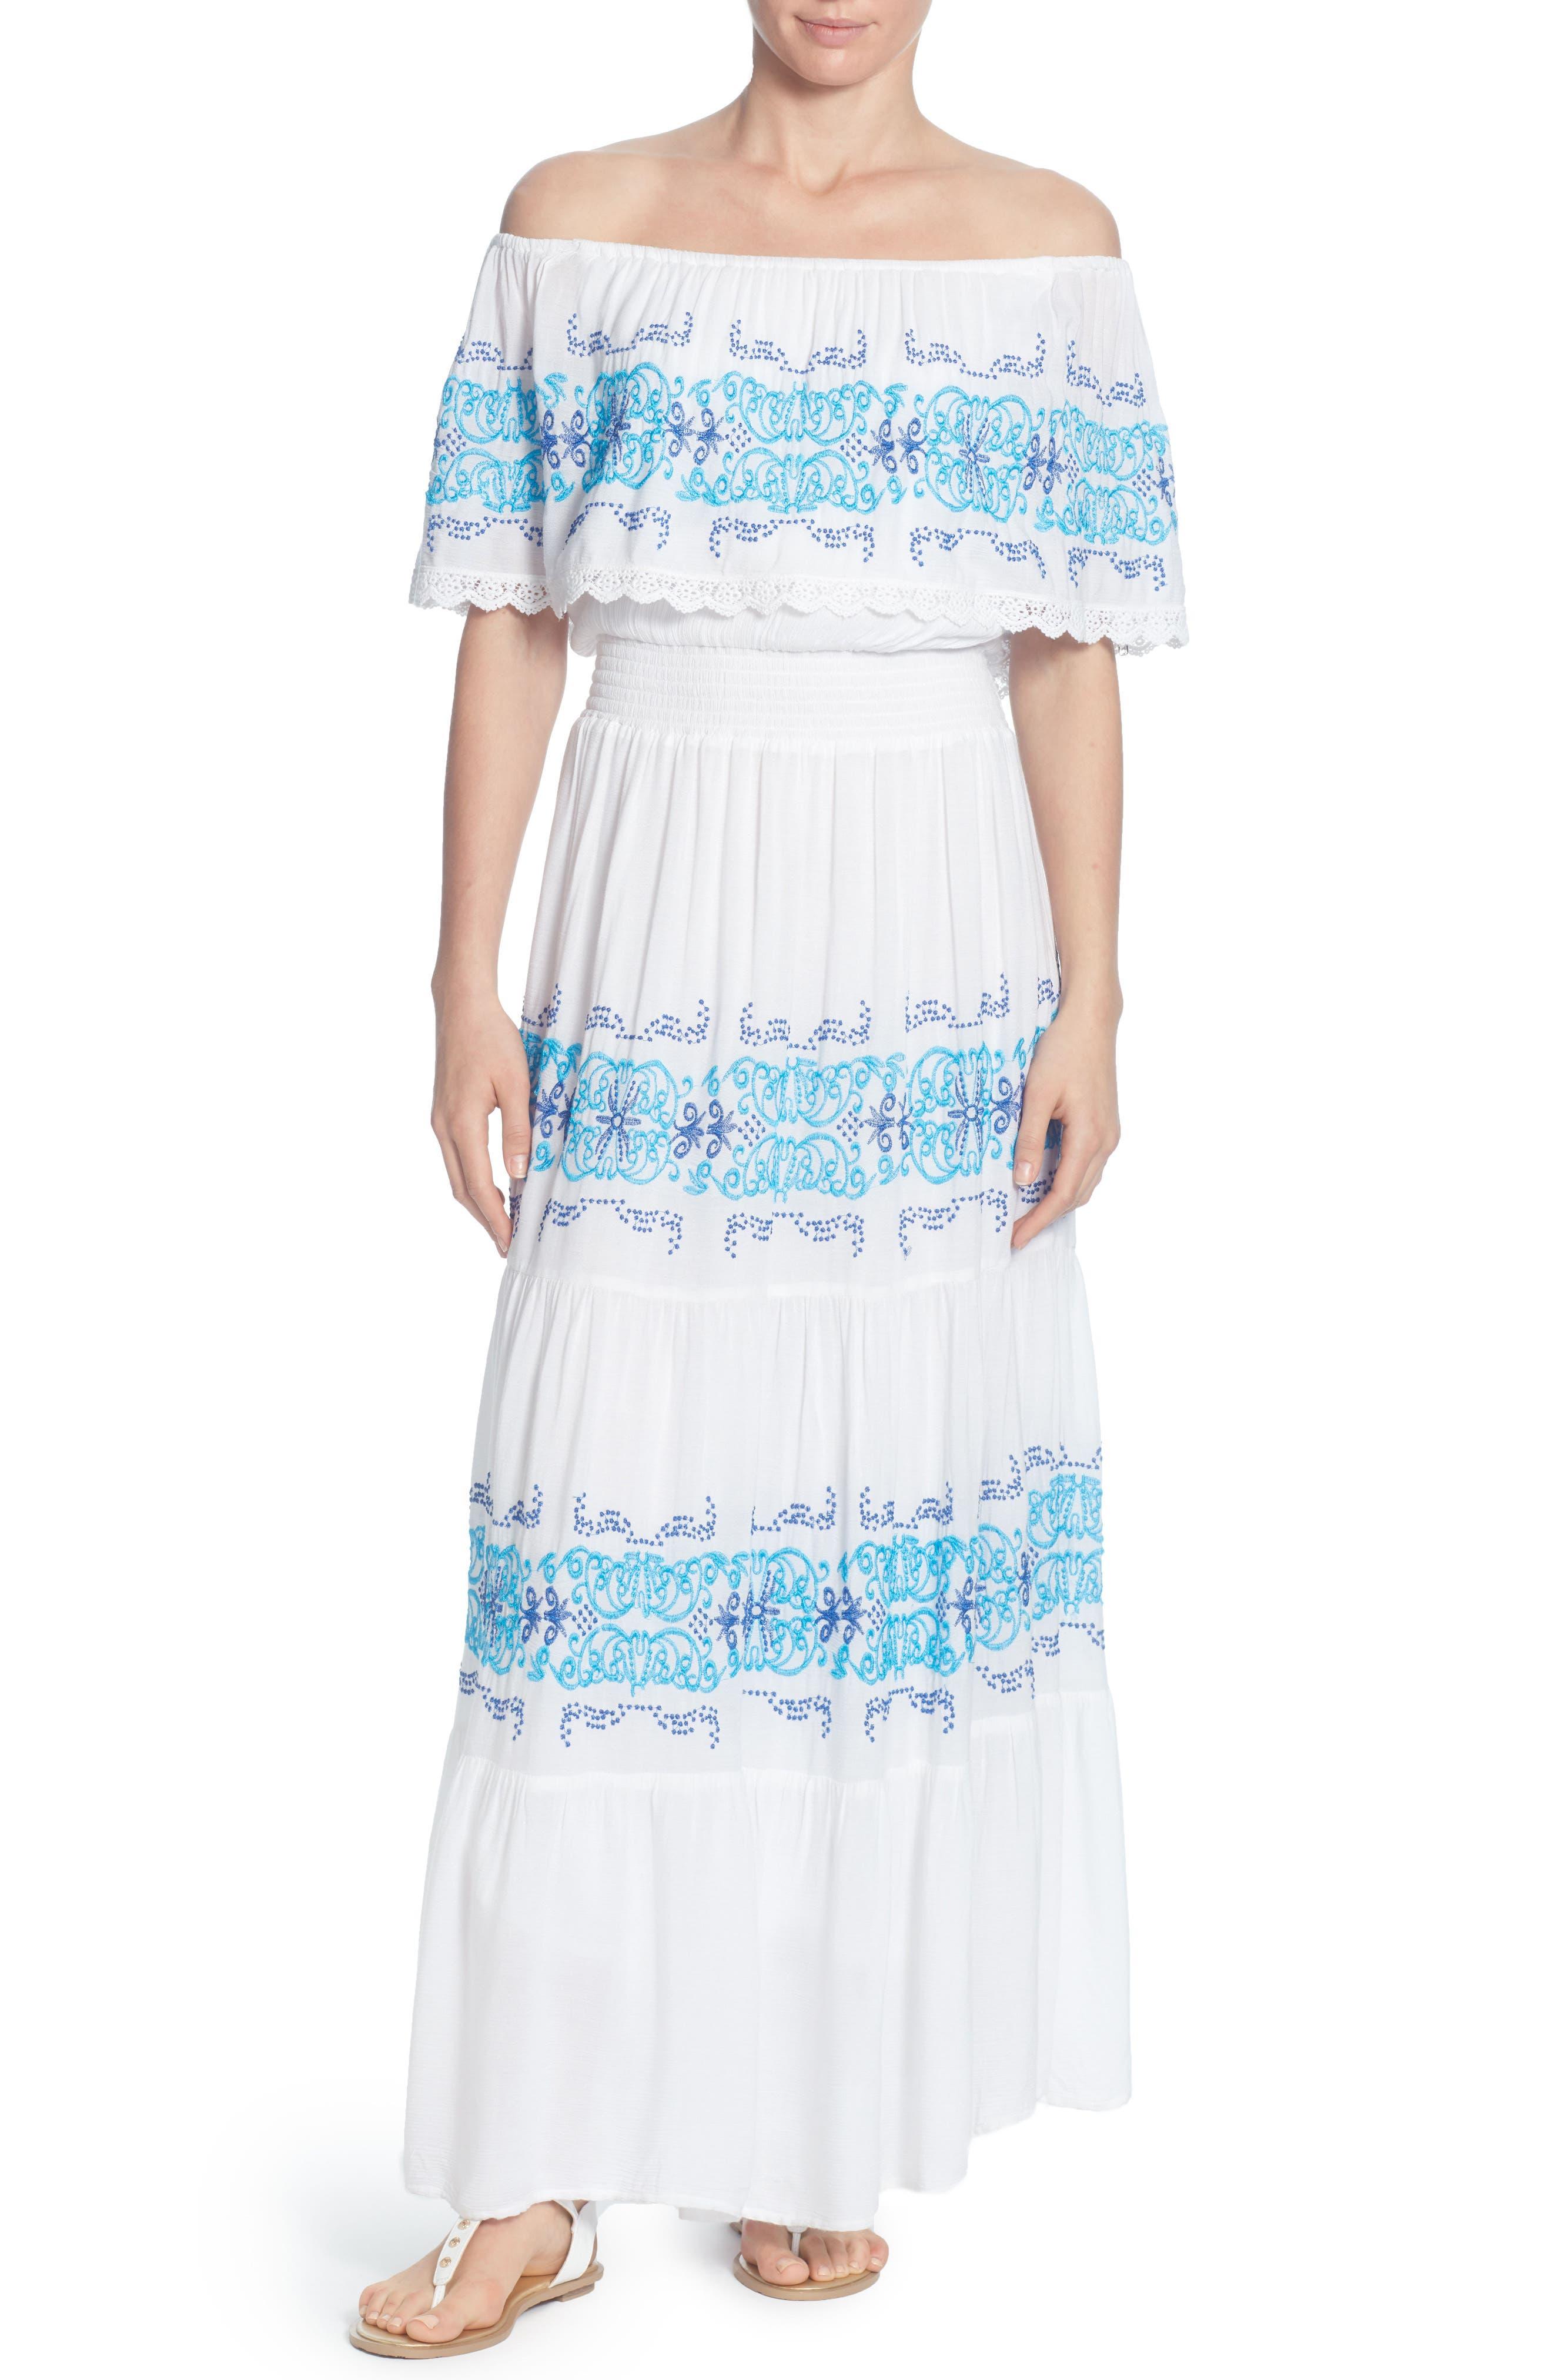 Catherine Catherine Malandrino Charise Maxi Dress, White